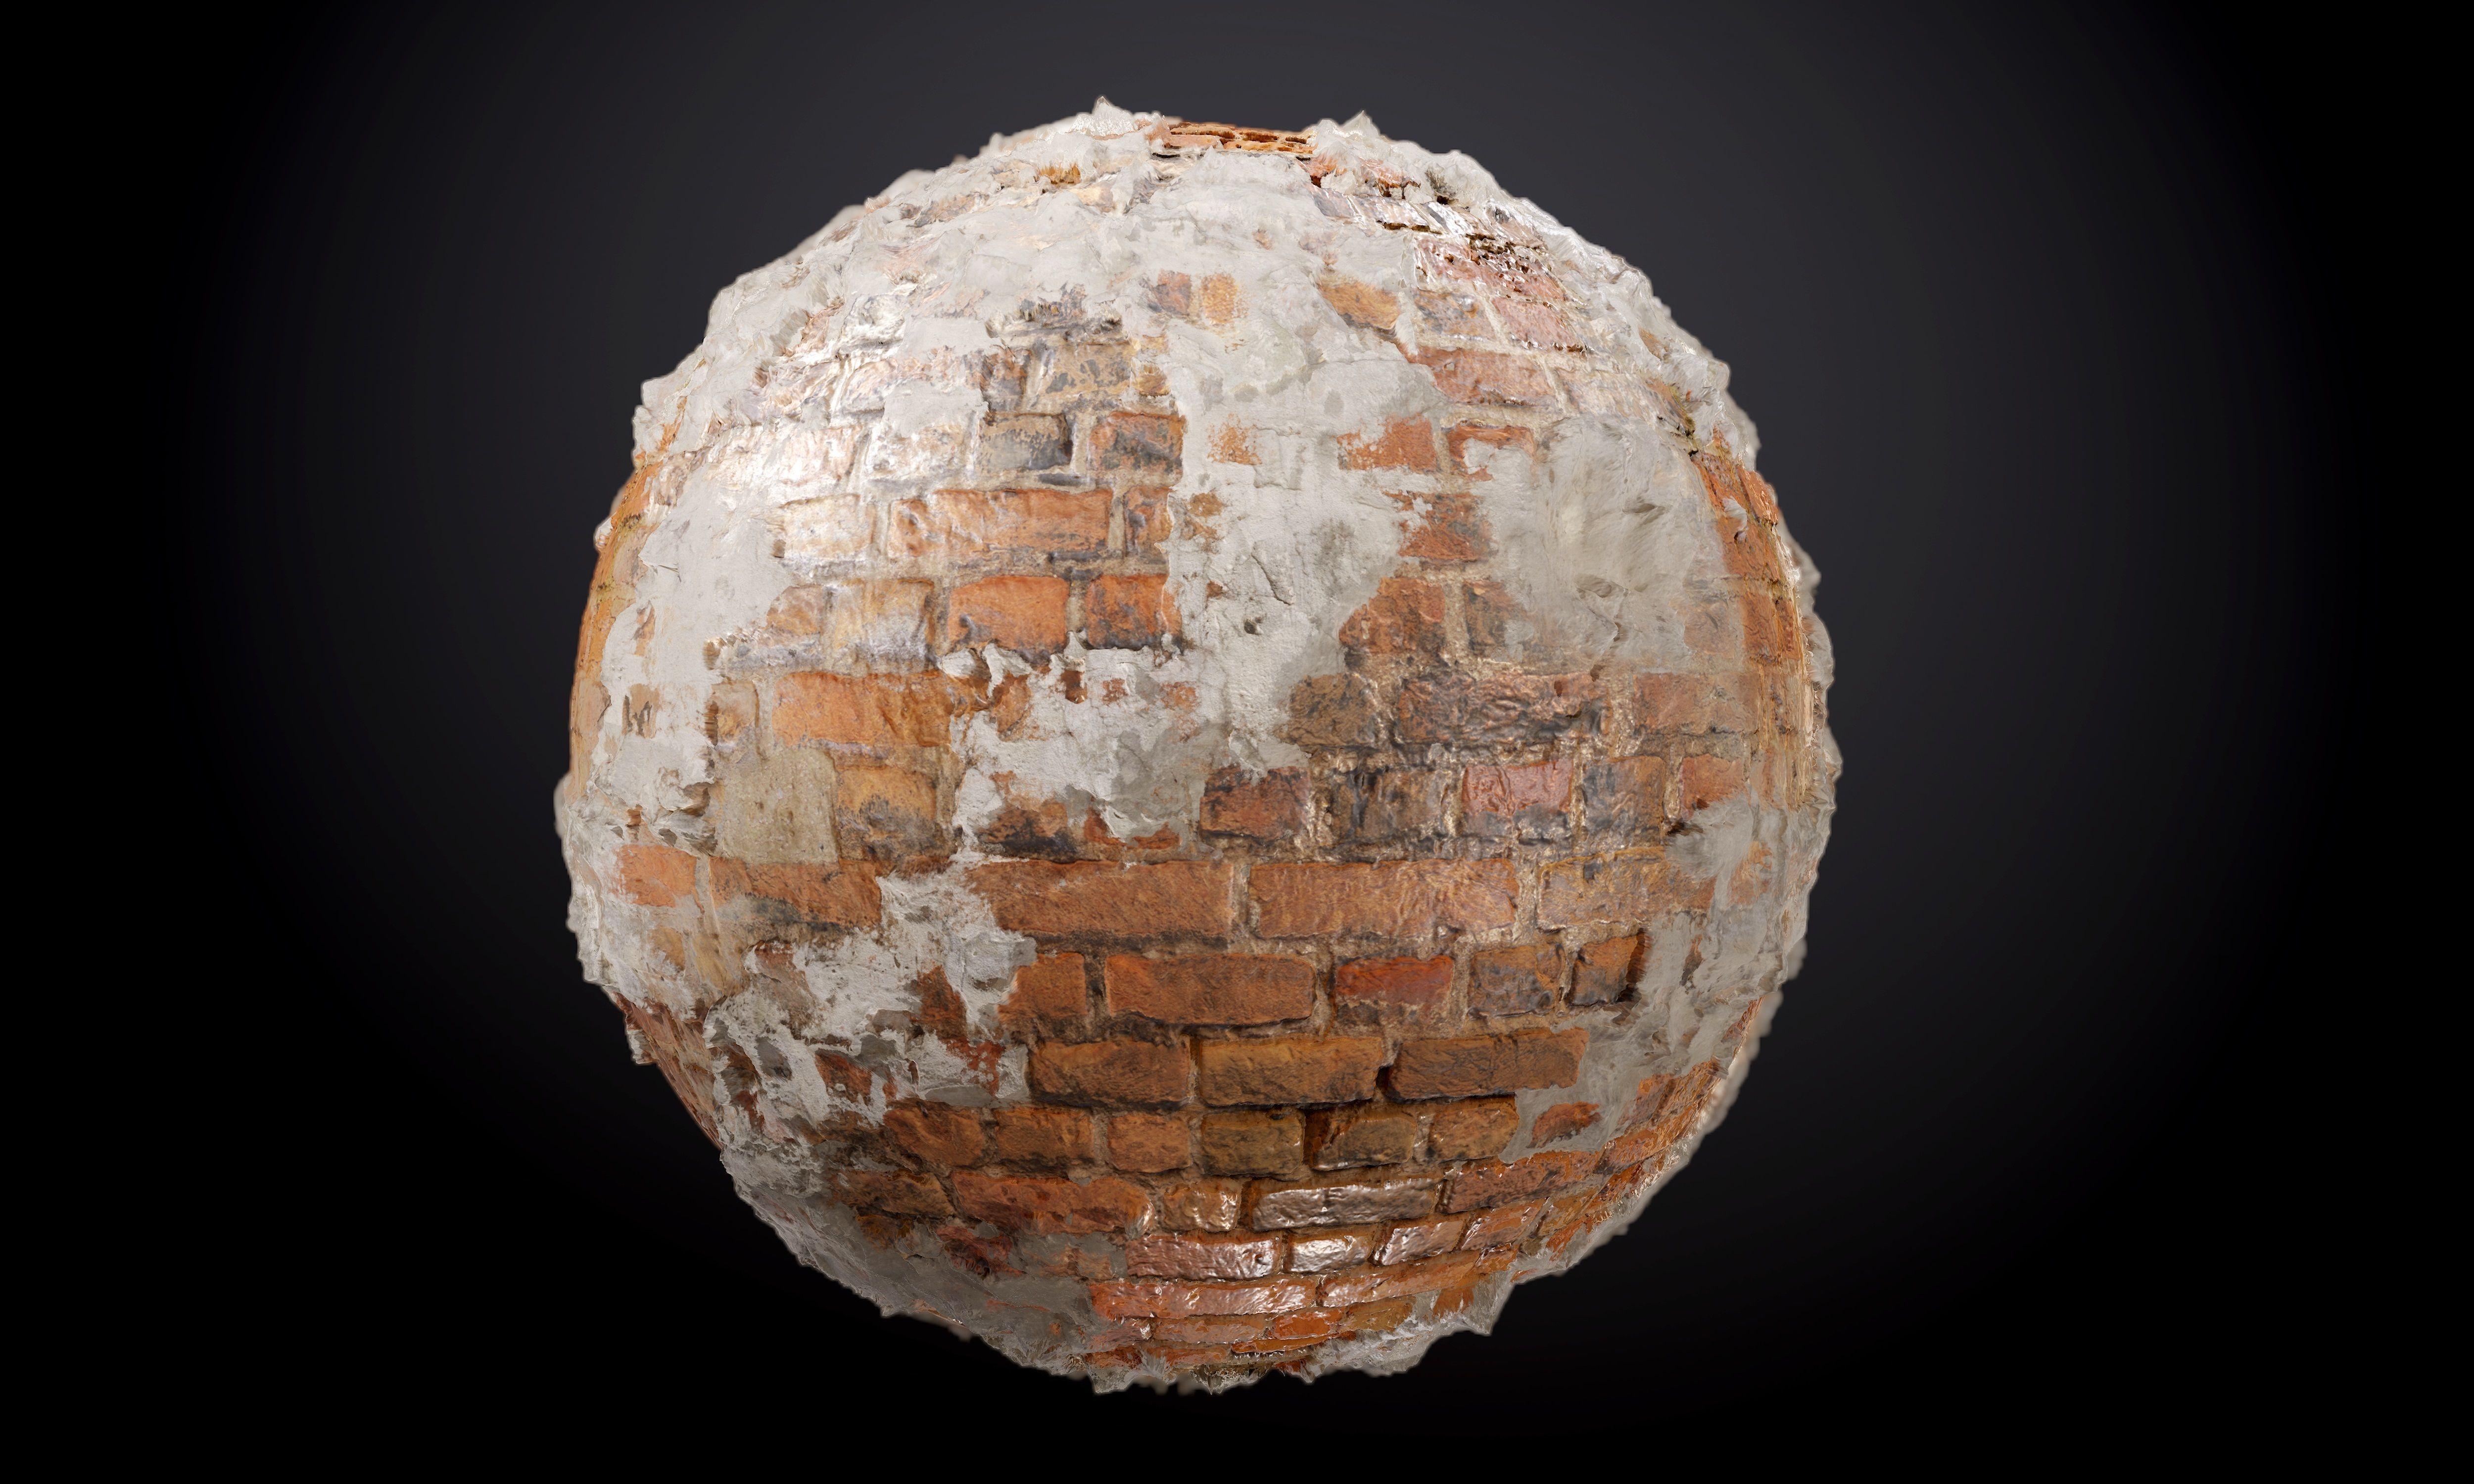 Brick Wall Sloppy Concrete Seamless PBR Texture